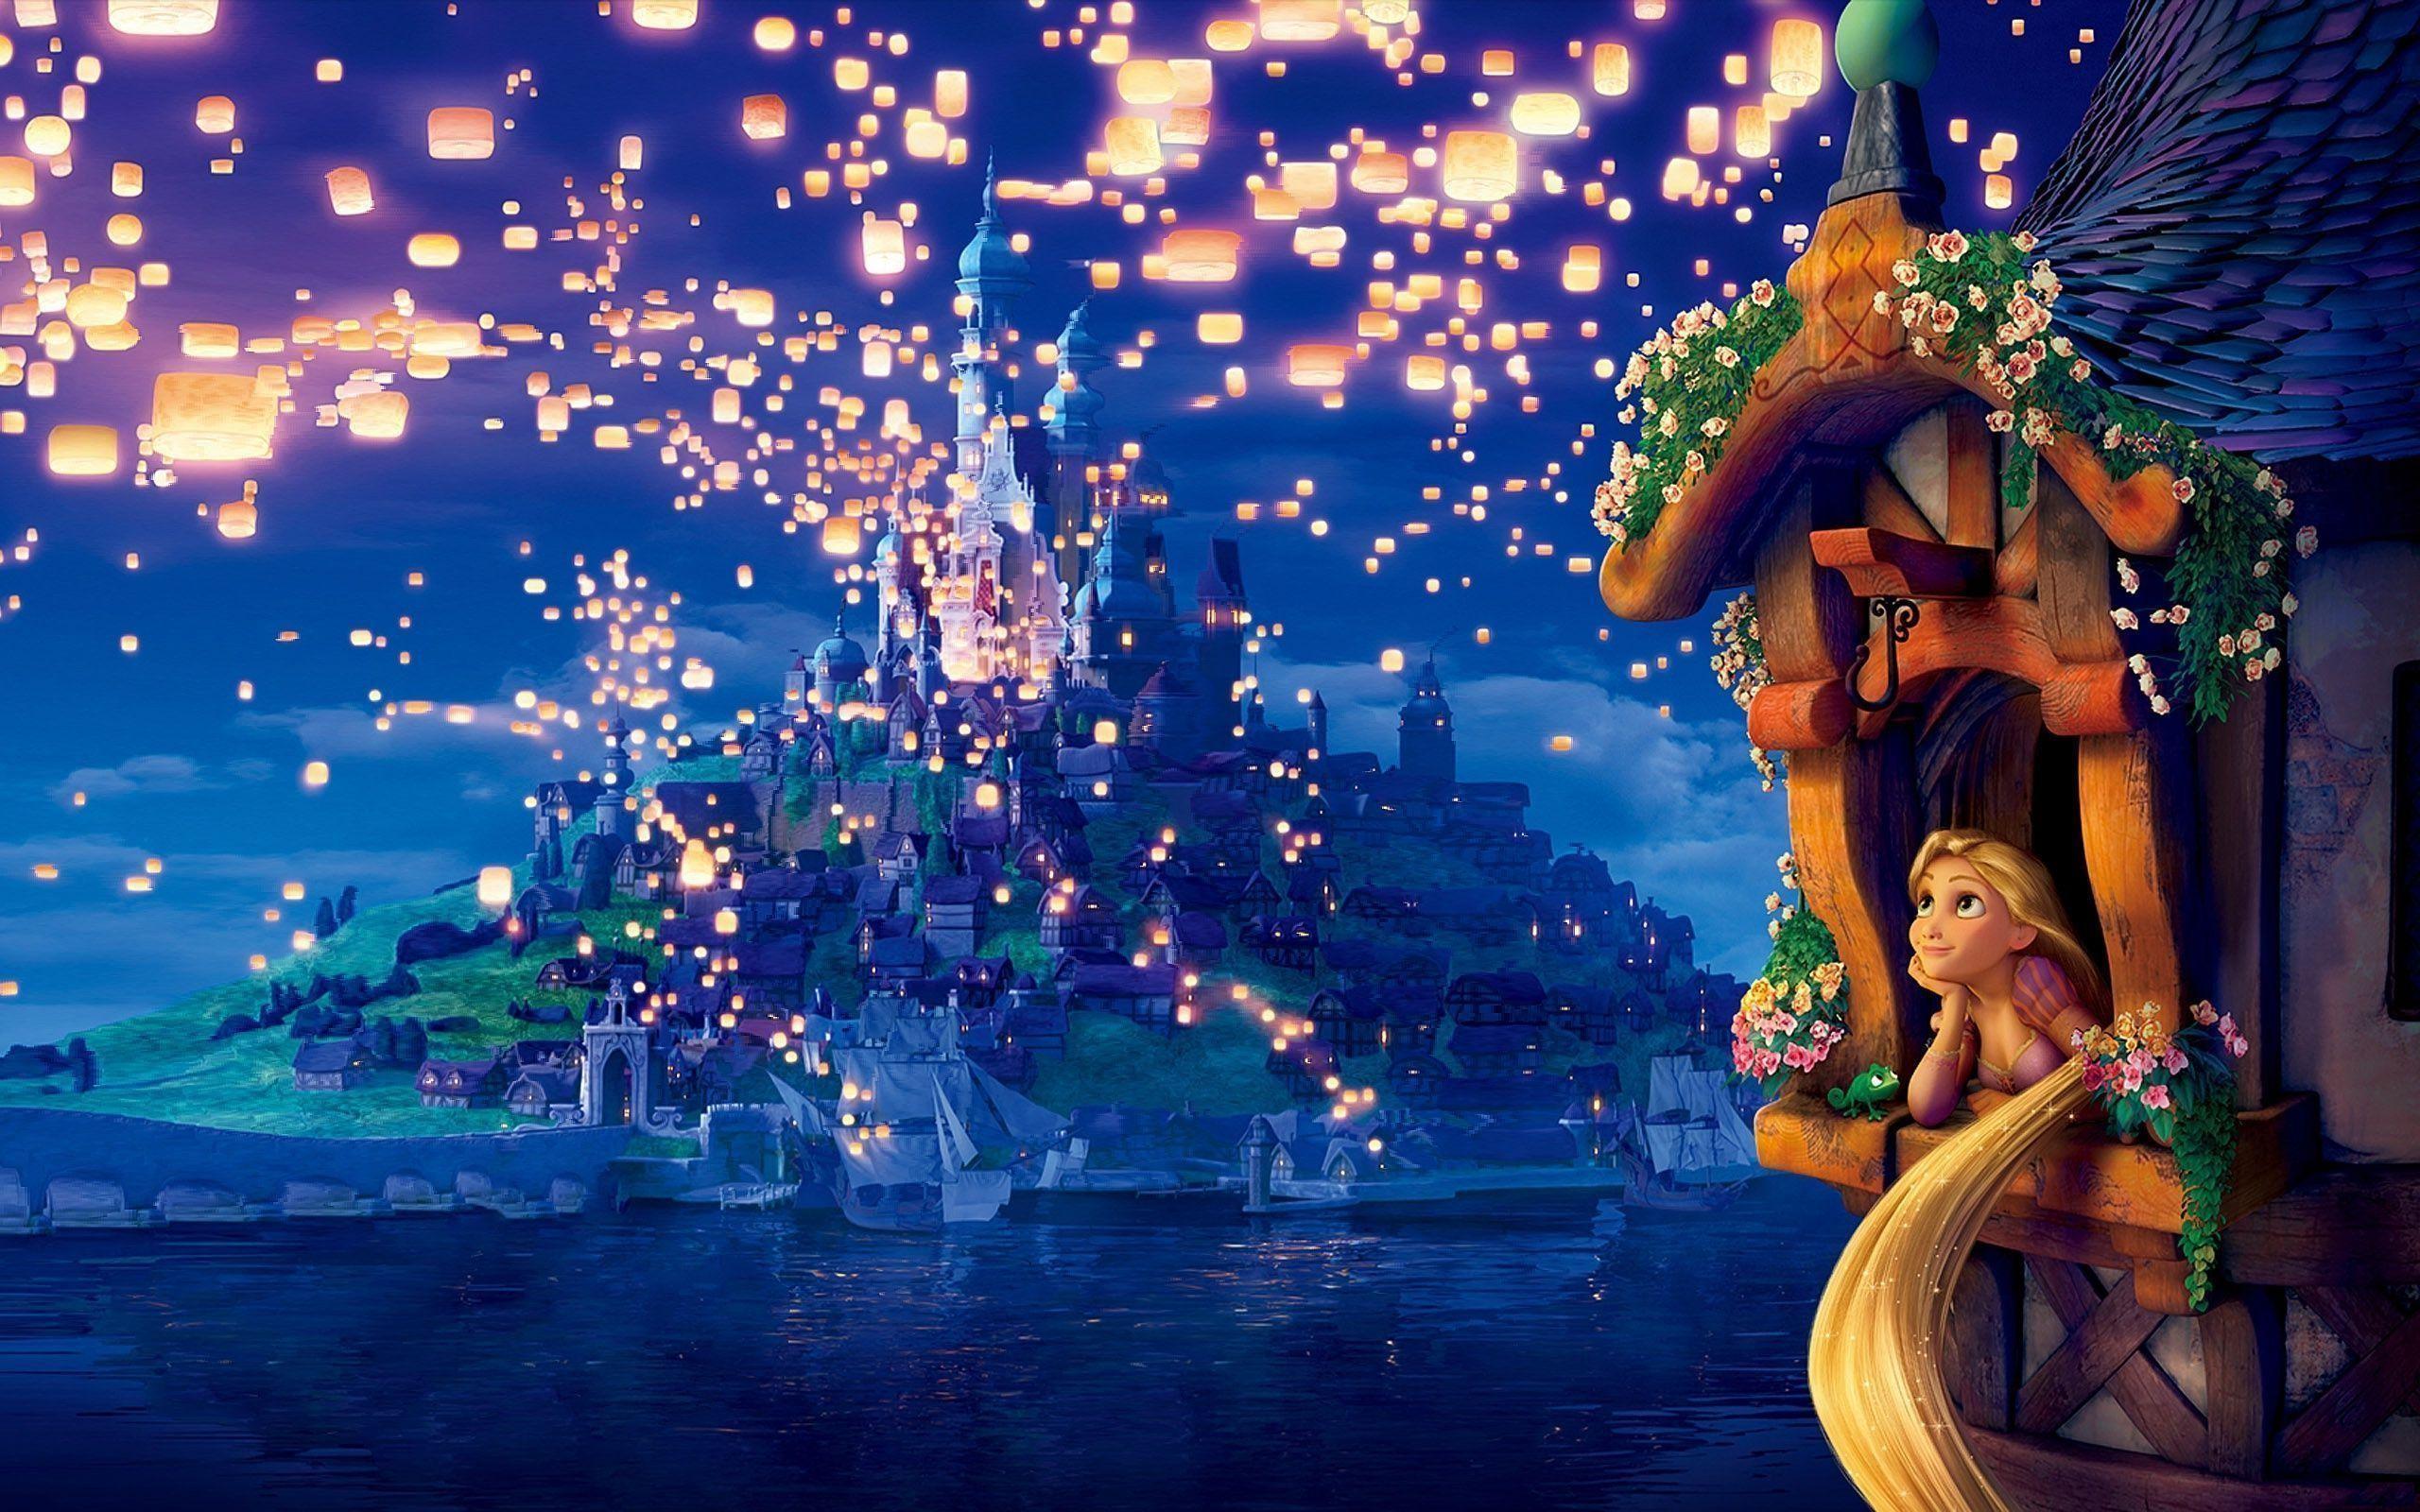 Disney Rapunzel Wallpaper Border 14016 Full HD Wallpaper Desktop .